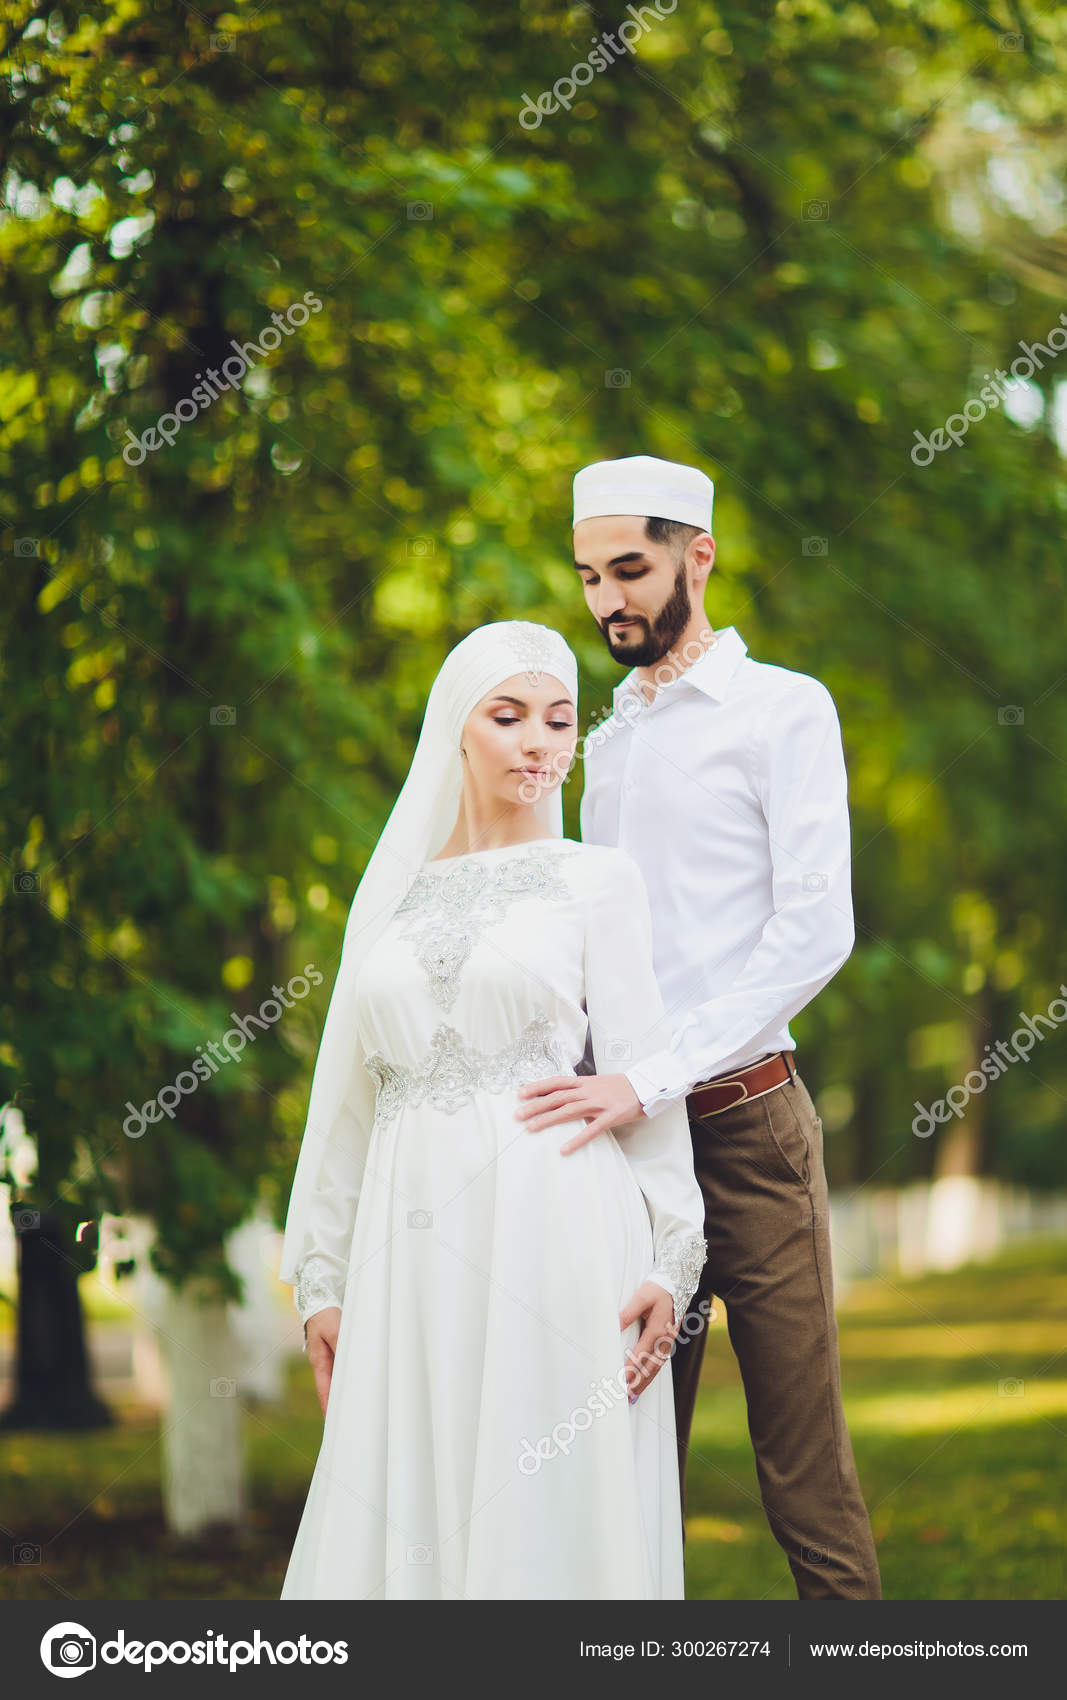 National wedding  Bride and groom  Wedding muslim couple